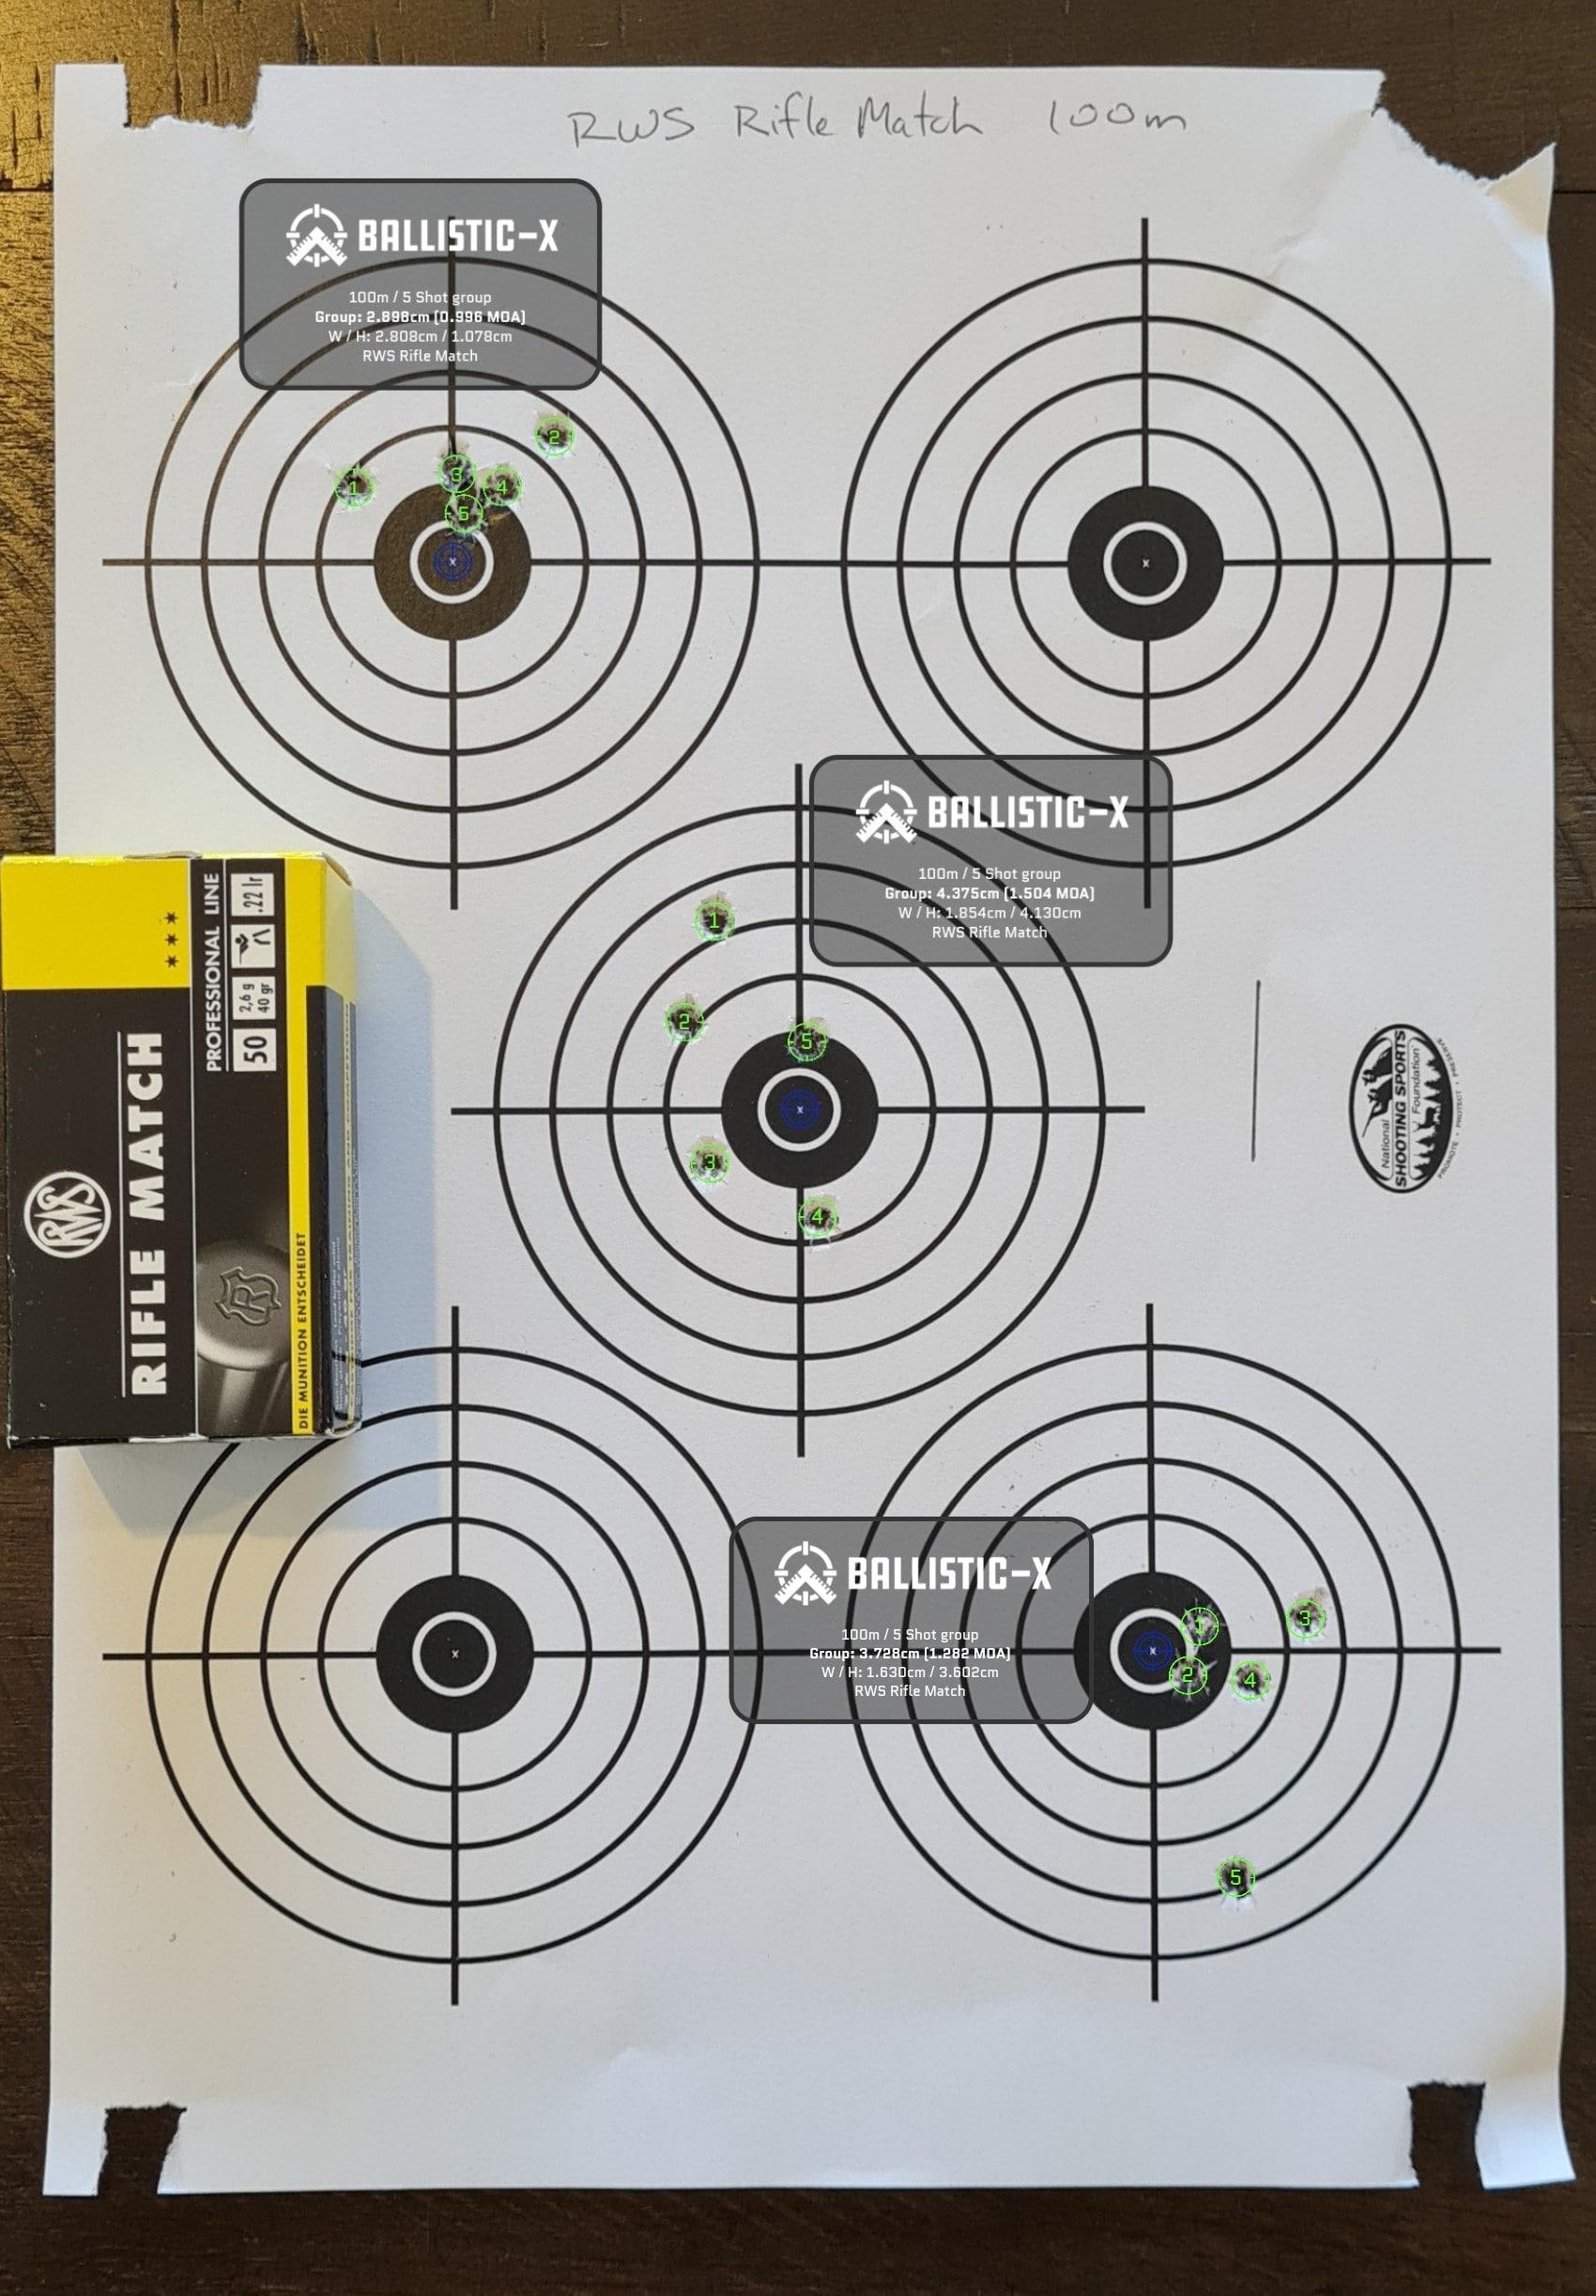 Name:  RWS Rifle Match 100.jpg Views: 127 Size:  434.6 KB